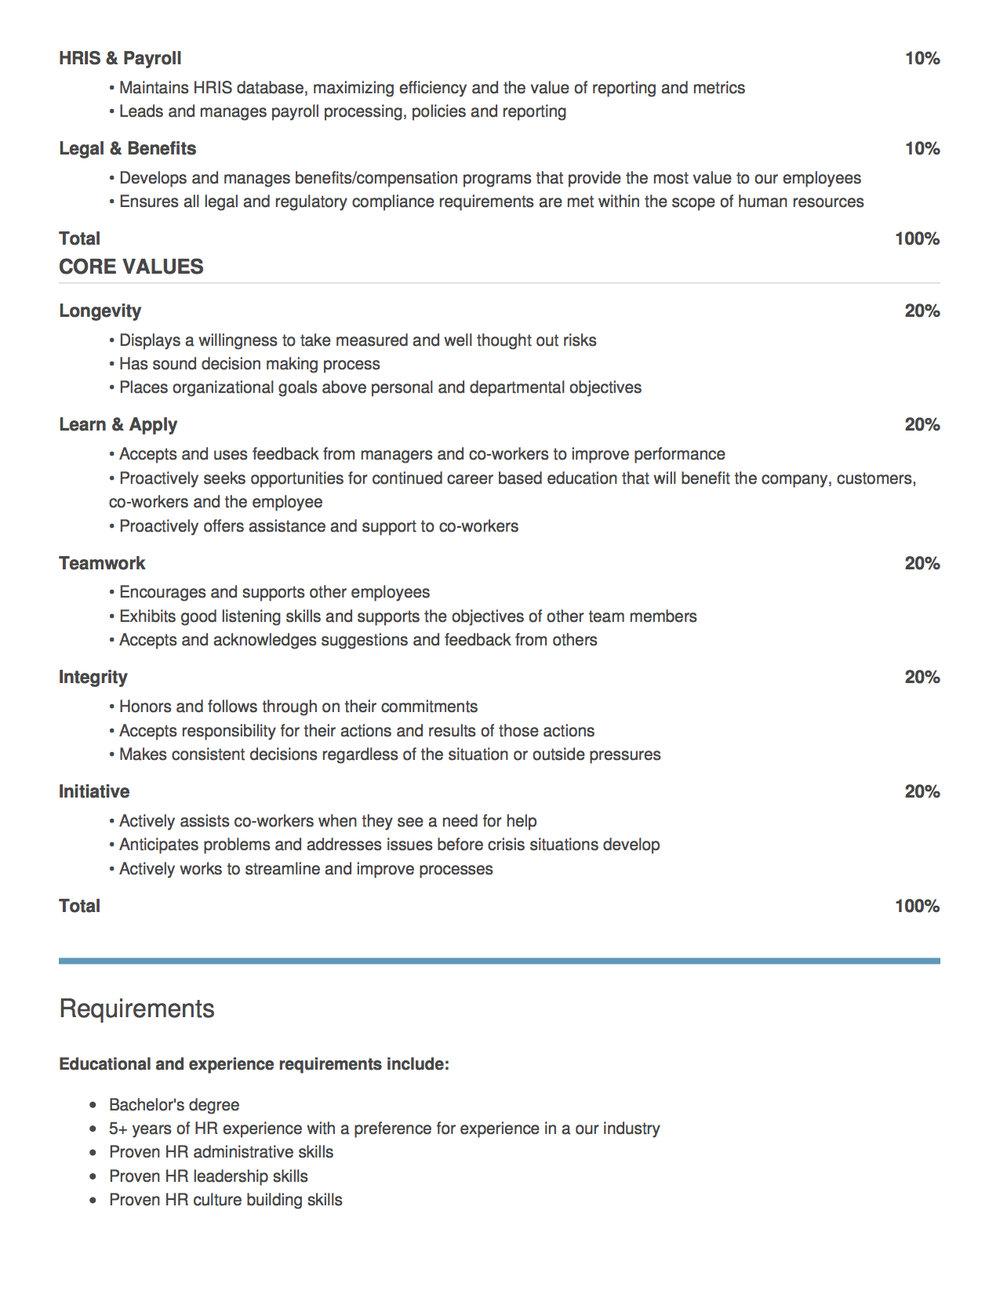 threads software updates print export job descriptions threads